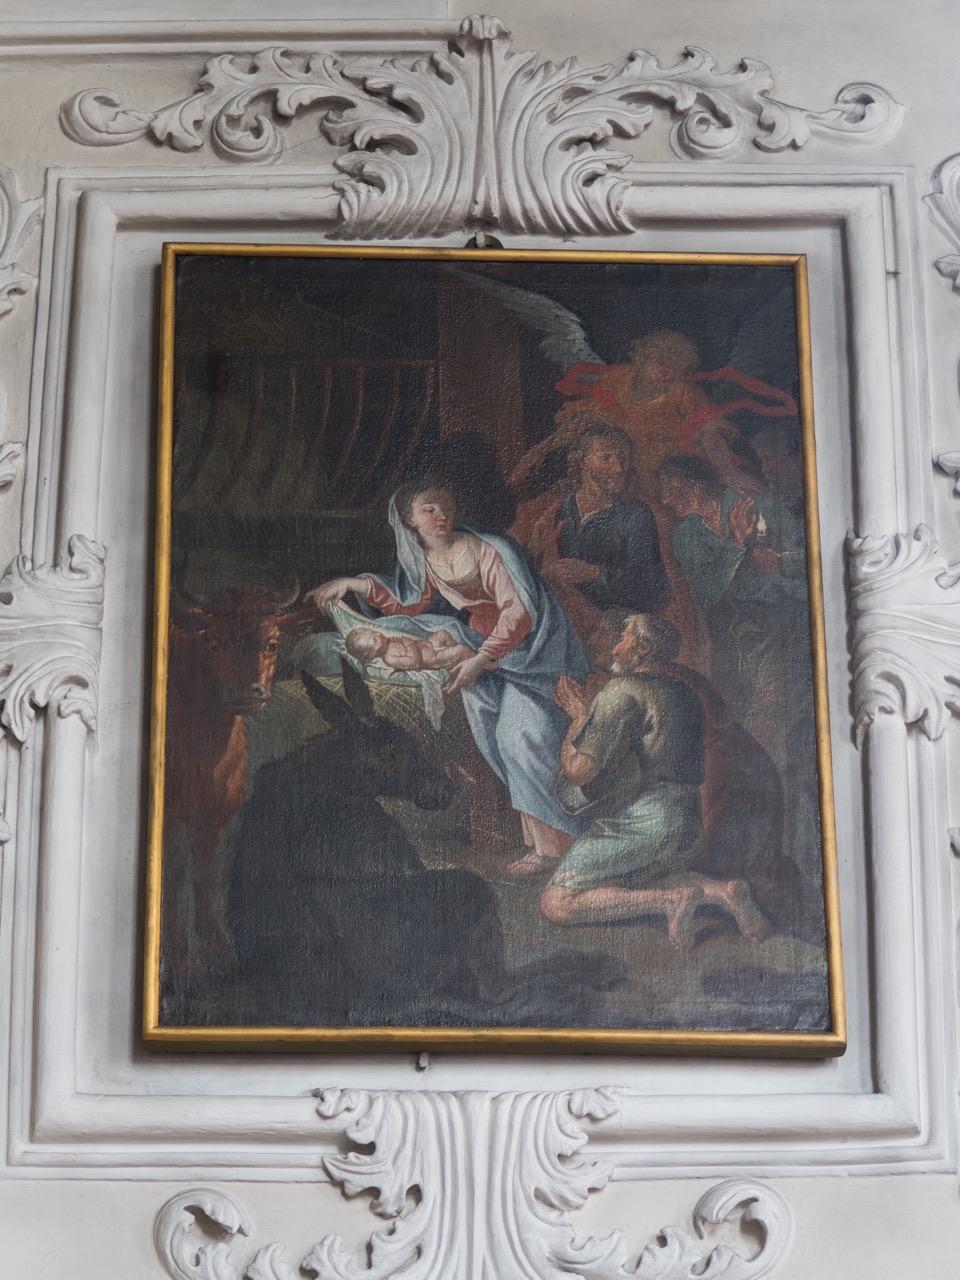 Geburt Christi, Schutzmantelkapelle